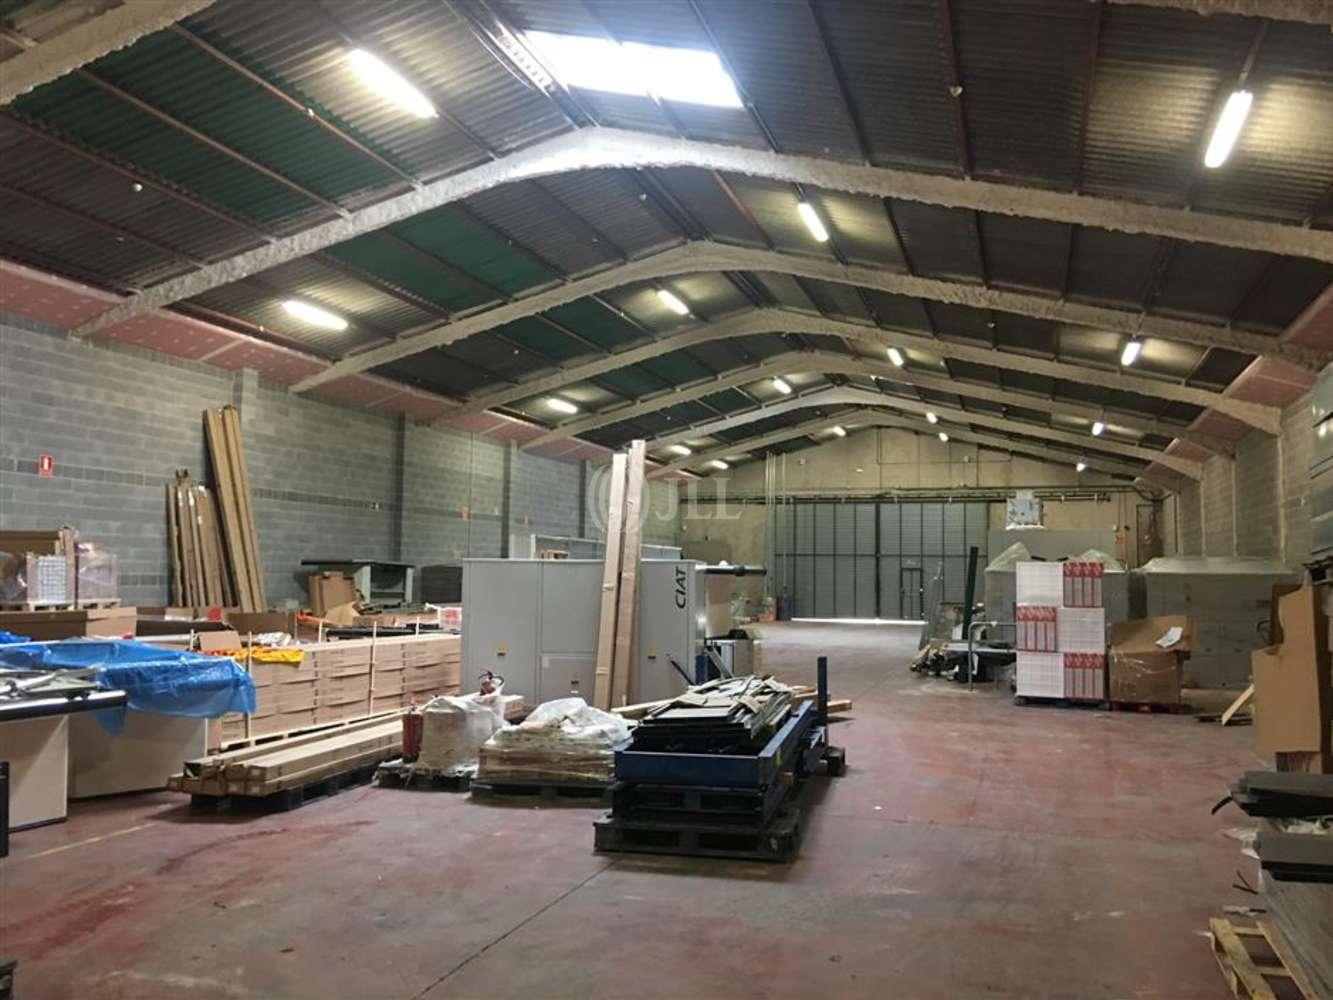 Naves industriales y logísticas Terrassa, 08227 - Nave Industrial - B0388 - TERRASSA - 7810